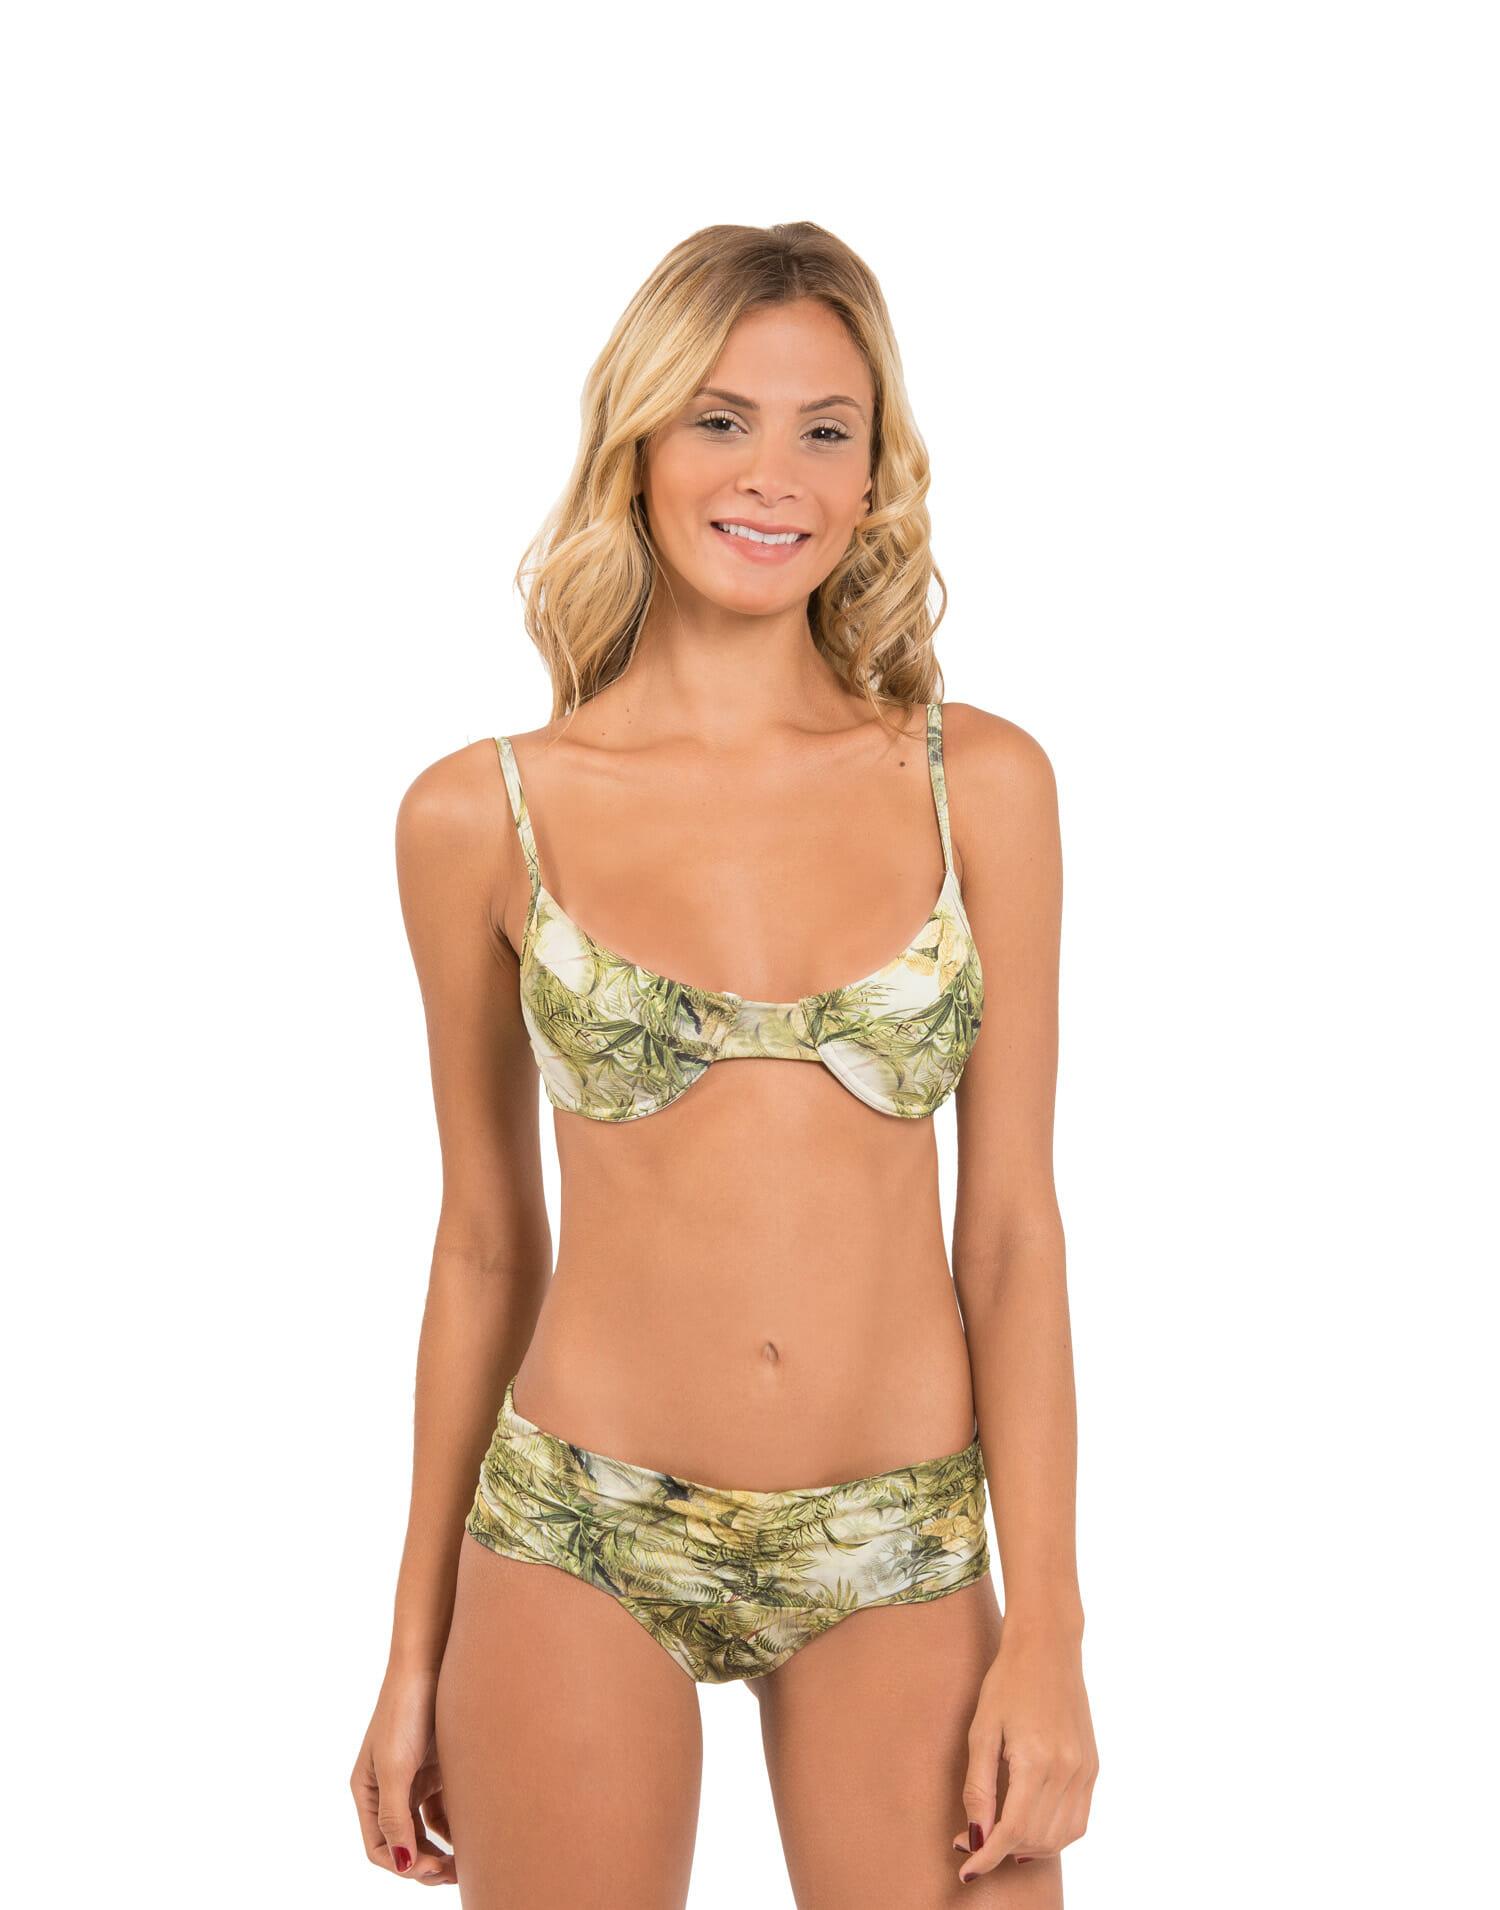 b640484b2b72 Conjunto Top de Biquíni Meia Taça e Barra Larga | Paraty - Blih! Brazilian  Bikini